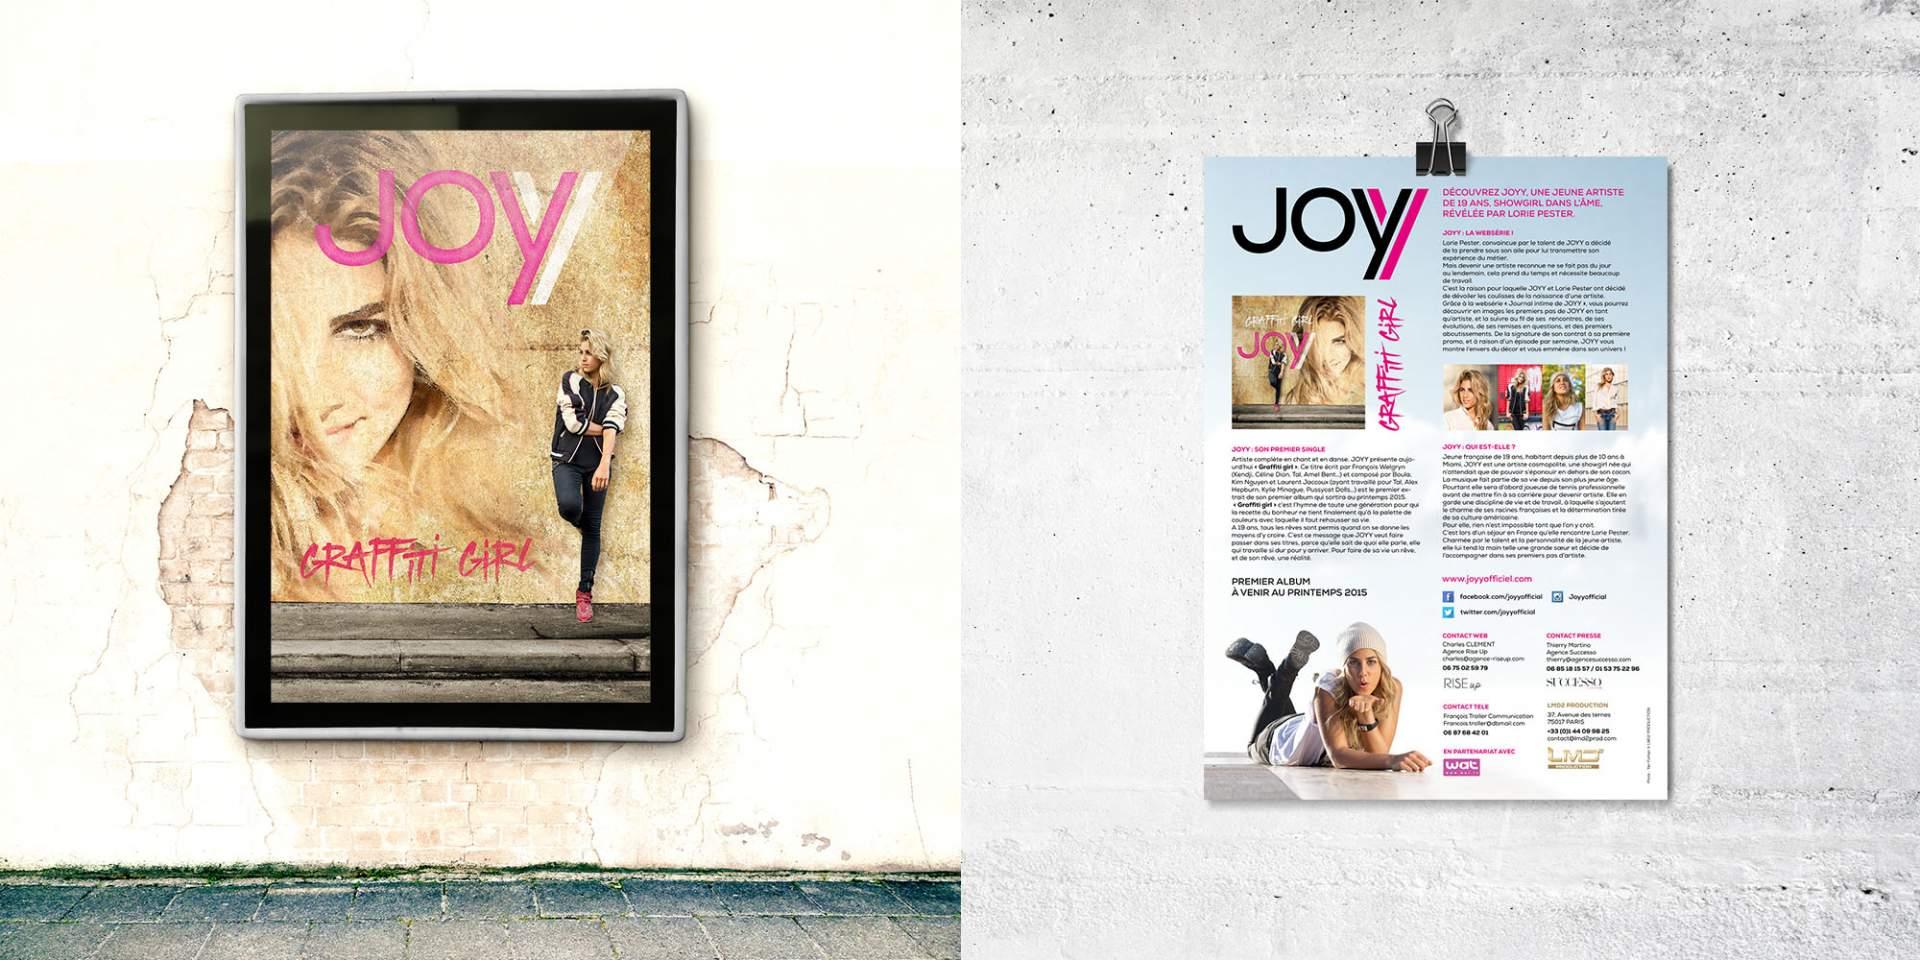 16-DA2 AGENCY-Joyy 03